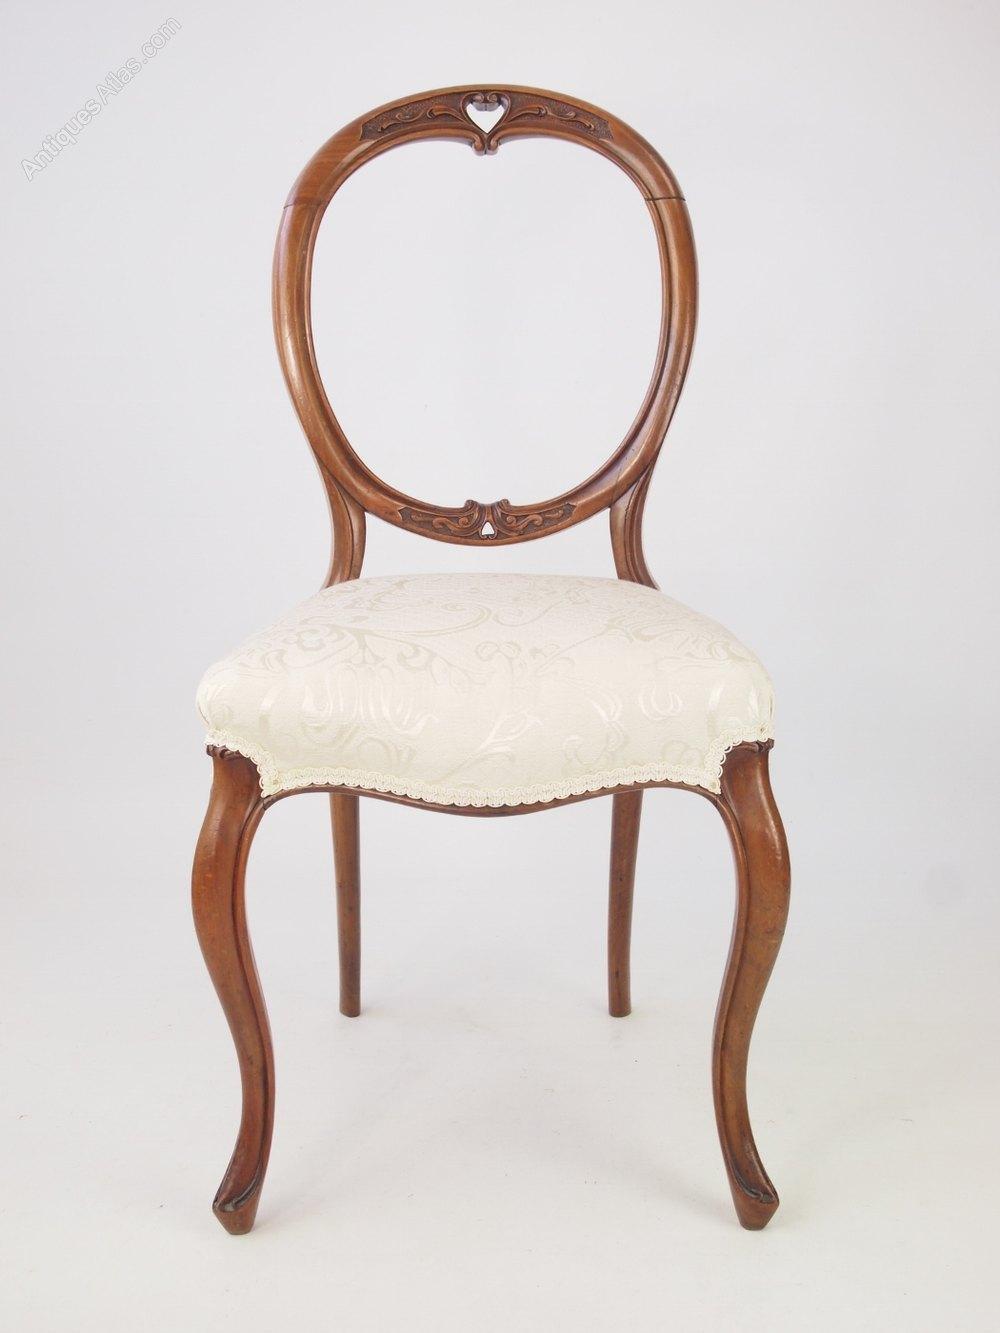 Antique Victorian Walnut Balloon Back Chair ... - Antique Victorian Walnut Balloon Back Chair - Antiques Atlas